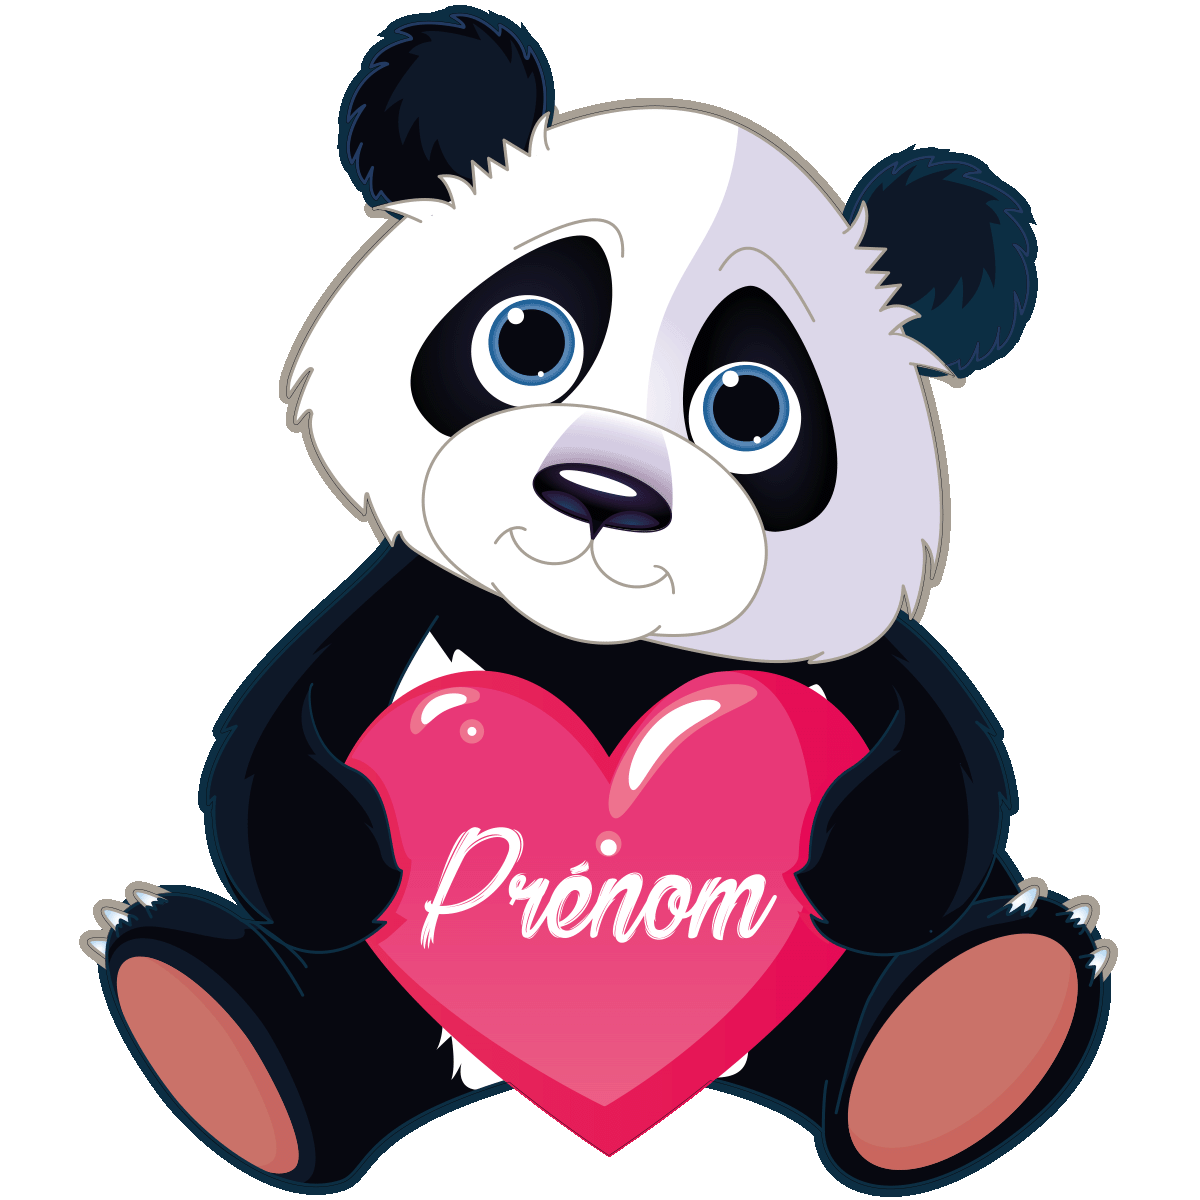 Sticker pr nom personnalis panda amoureux stickers filles coeurs ambiance sticker - Coloriage de panda kawaii ...